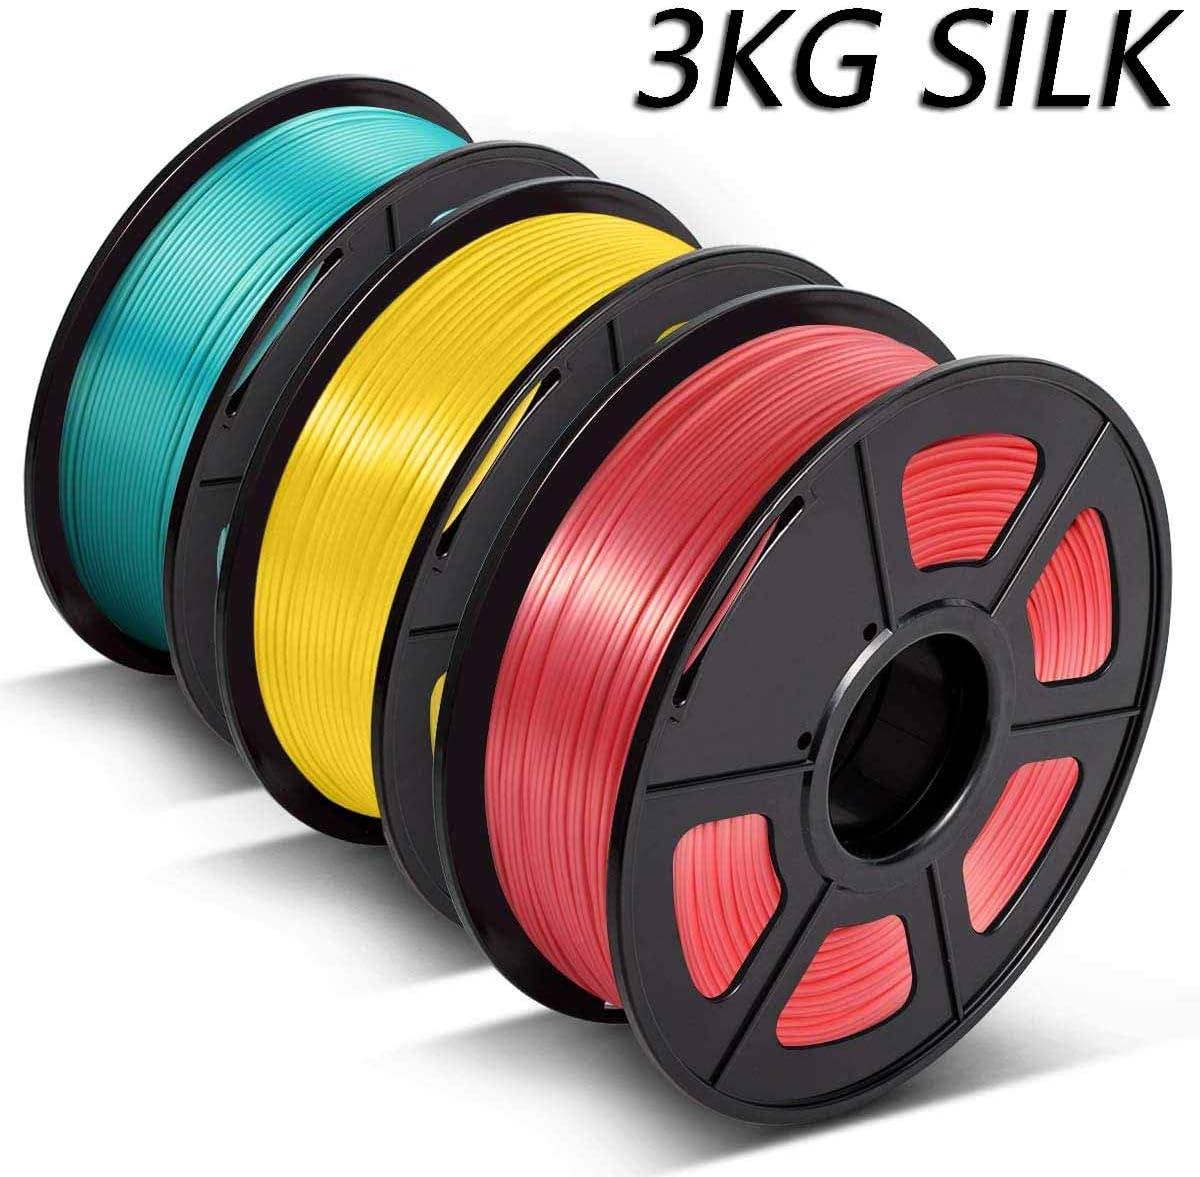 // 0.02 mm,Printing Smooth 3D Filament Silk PLA 1.75mm,3D Warhorse Shiny Silk PLA Filament for 3D Printer,Silk Filament WatermelonRed+Yellow+GrassGreen,3 Spool,Dimensional Accuracy KG